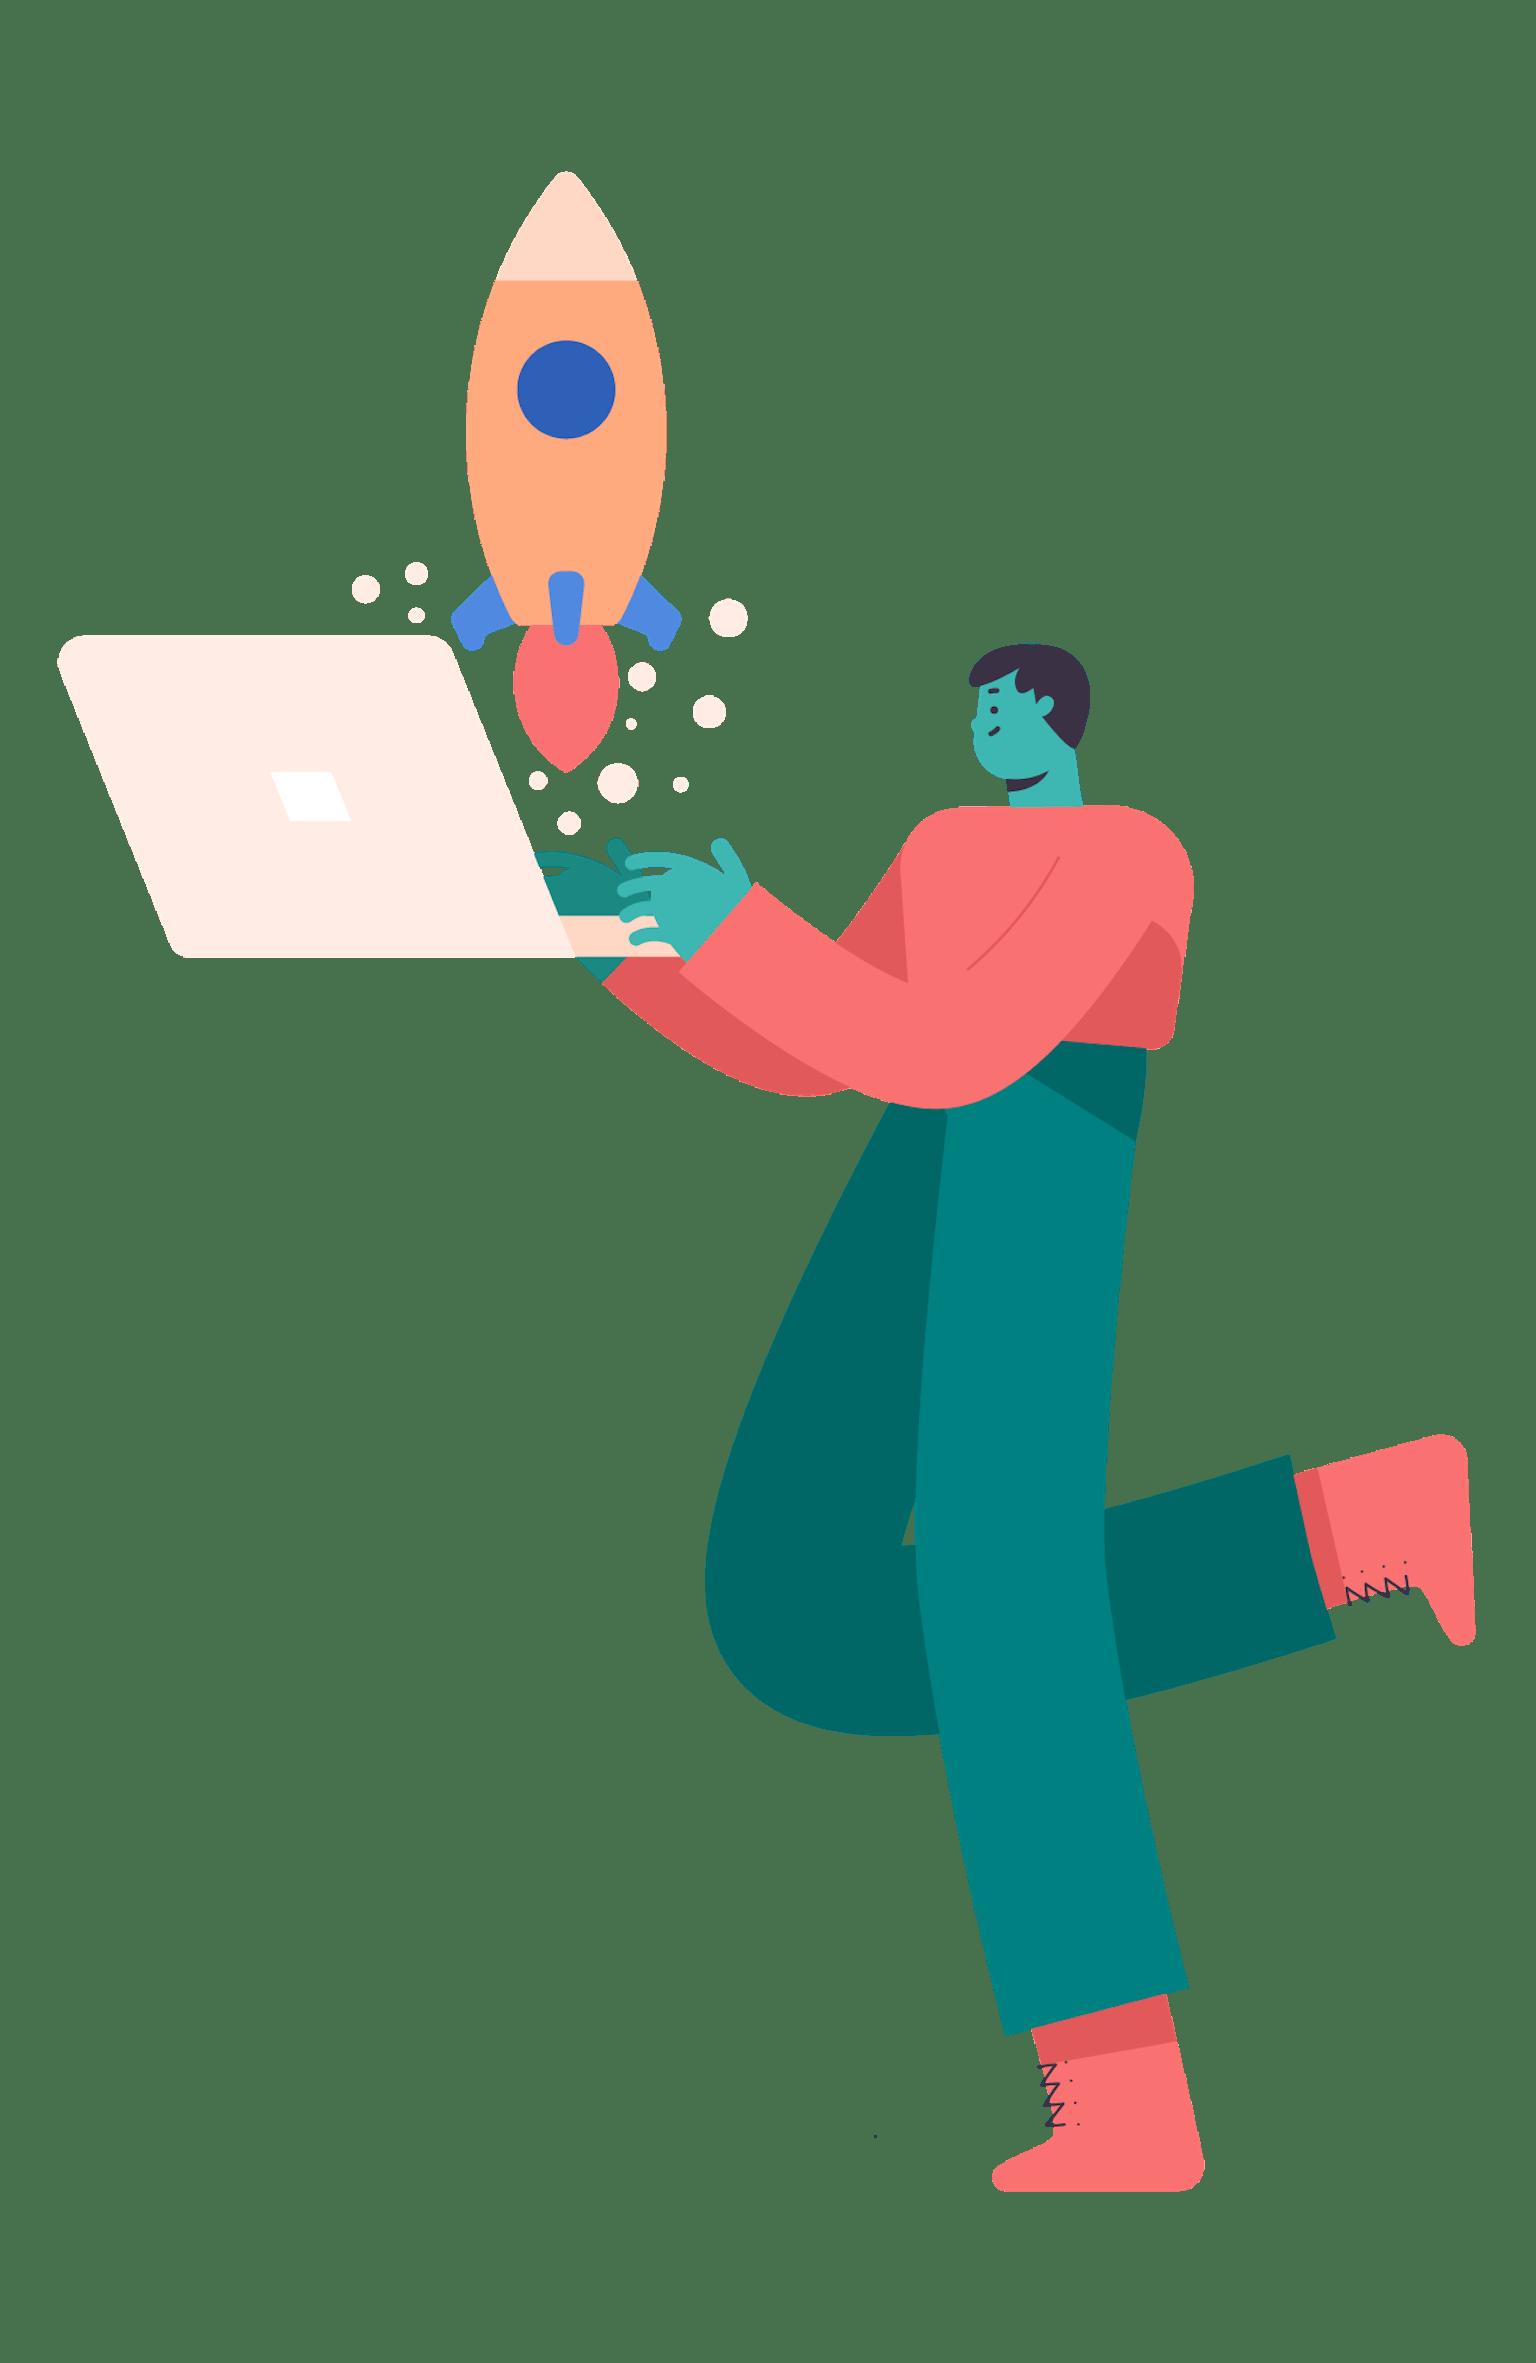 social media lead generation service dubai